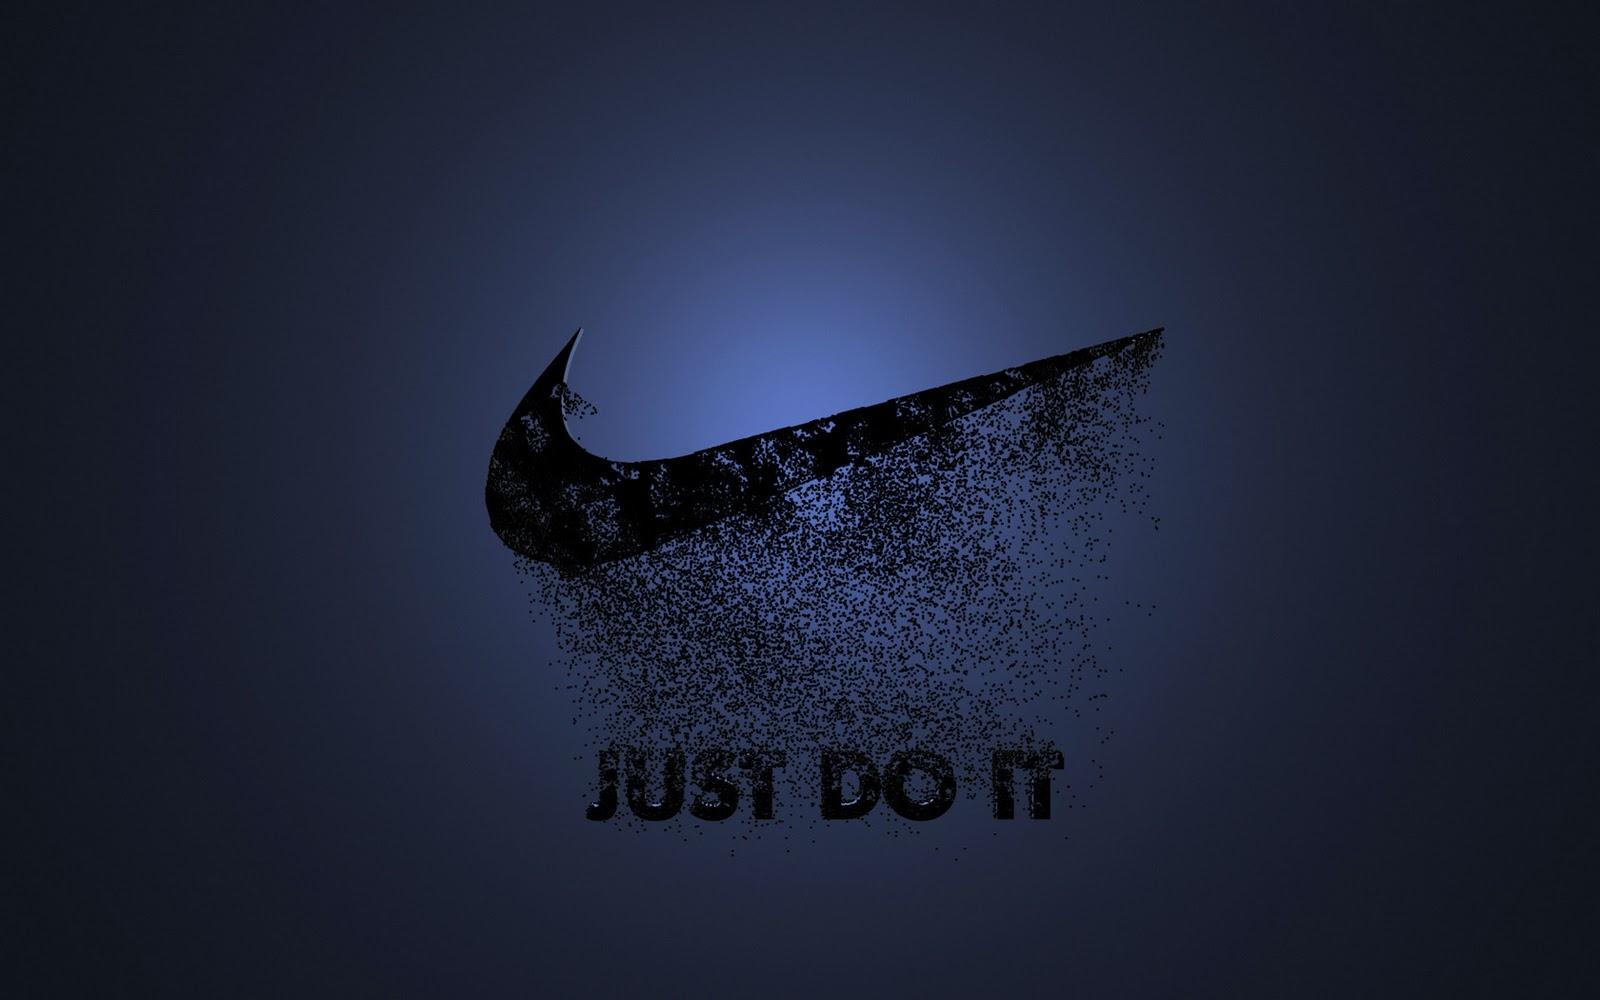 Nike just do it logo iphone wallpaper download roblox - Nike Wallpaper Just Do It Hd Wallpaper Background